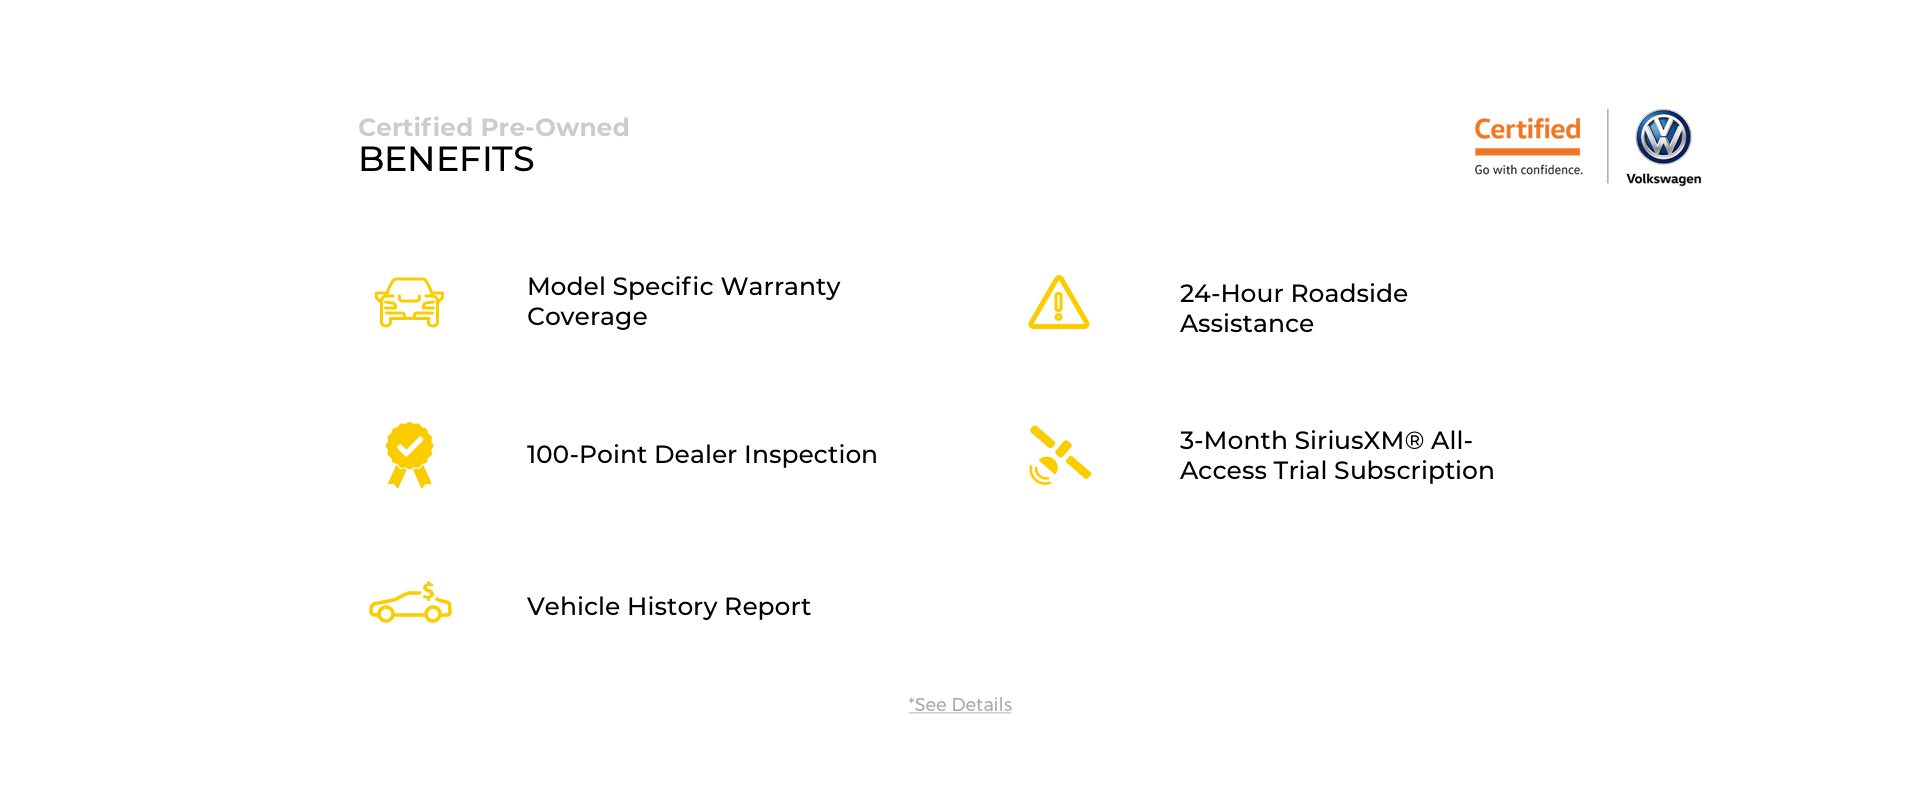 CPO Benefits Volkswagen Desktop V3